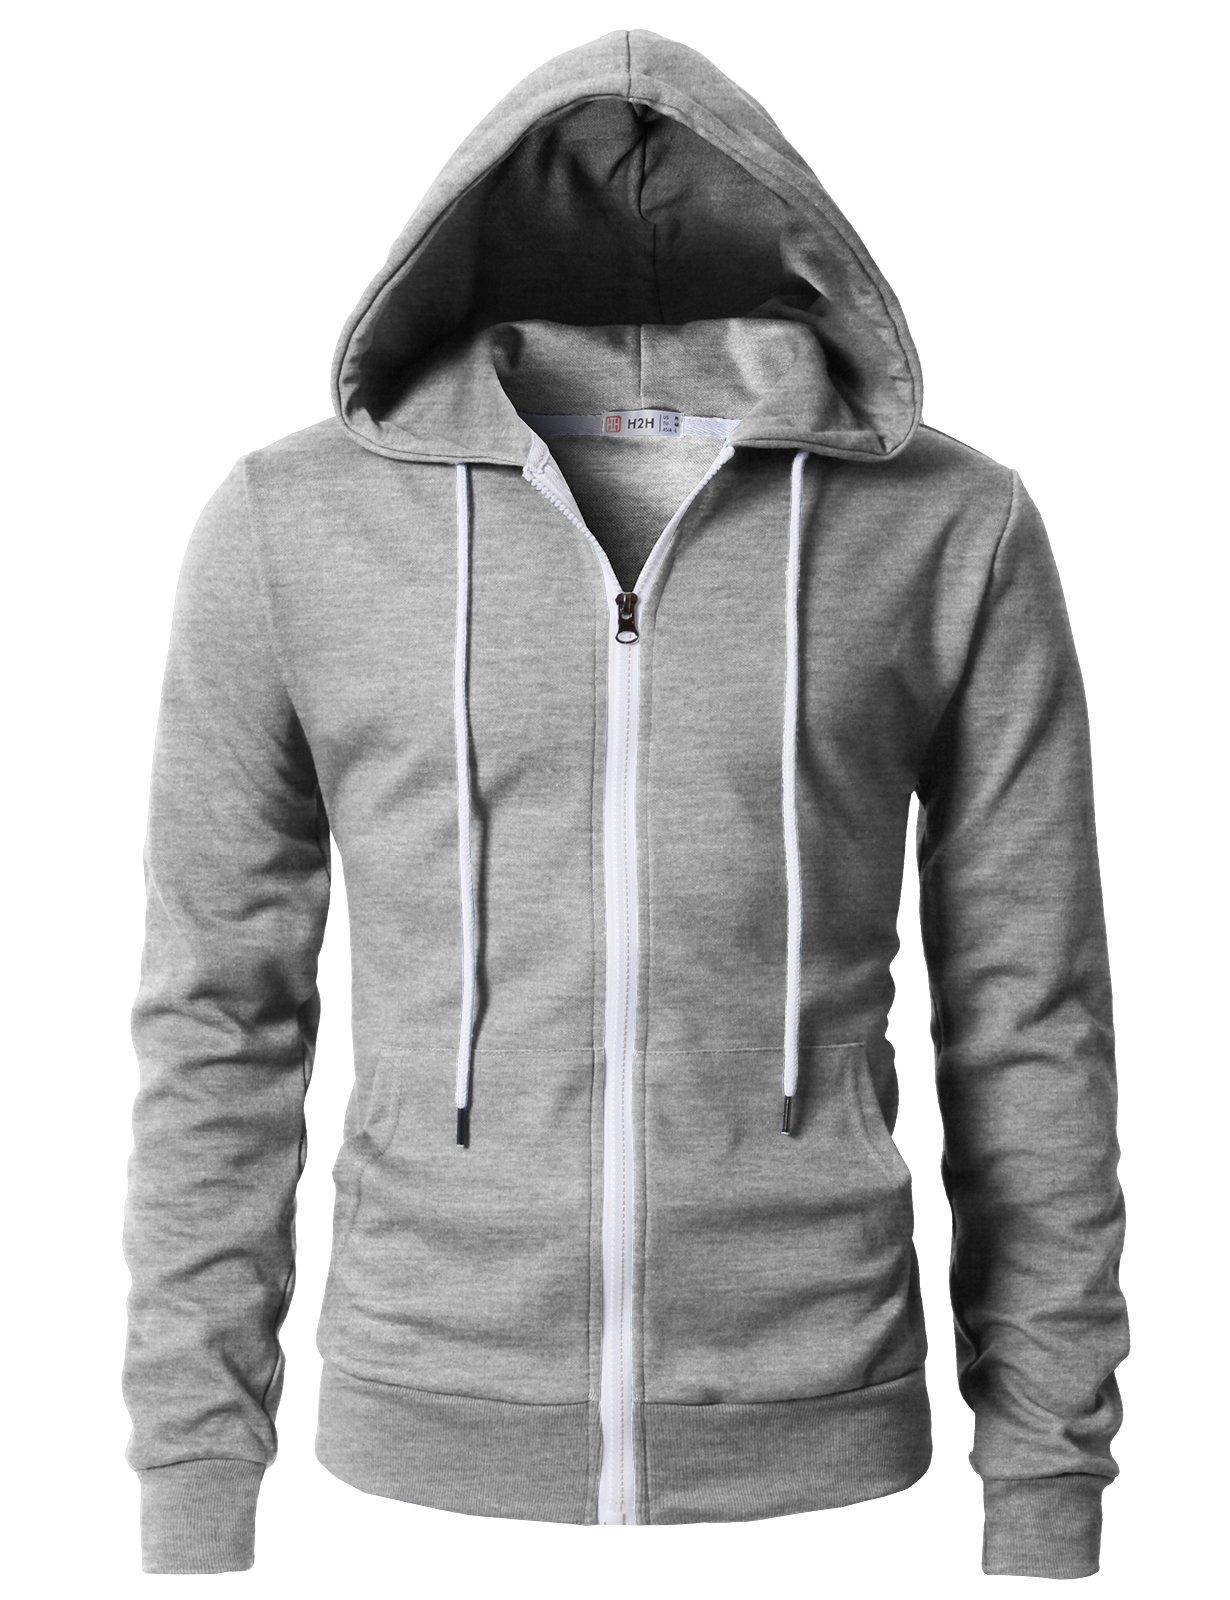 H2H Mens Regular Fit Long Sleeve Lightweight Contrast Zip-up Hoodie Gray US L/Asia XL (KMOHOL0131)